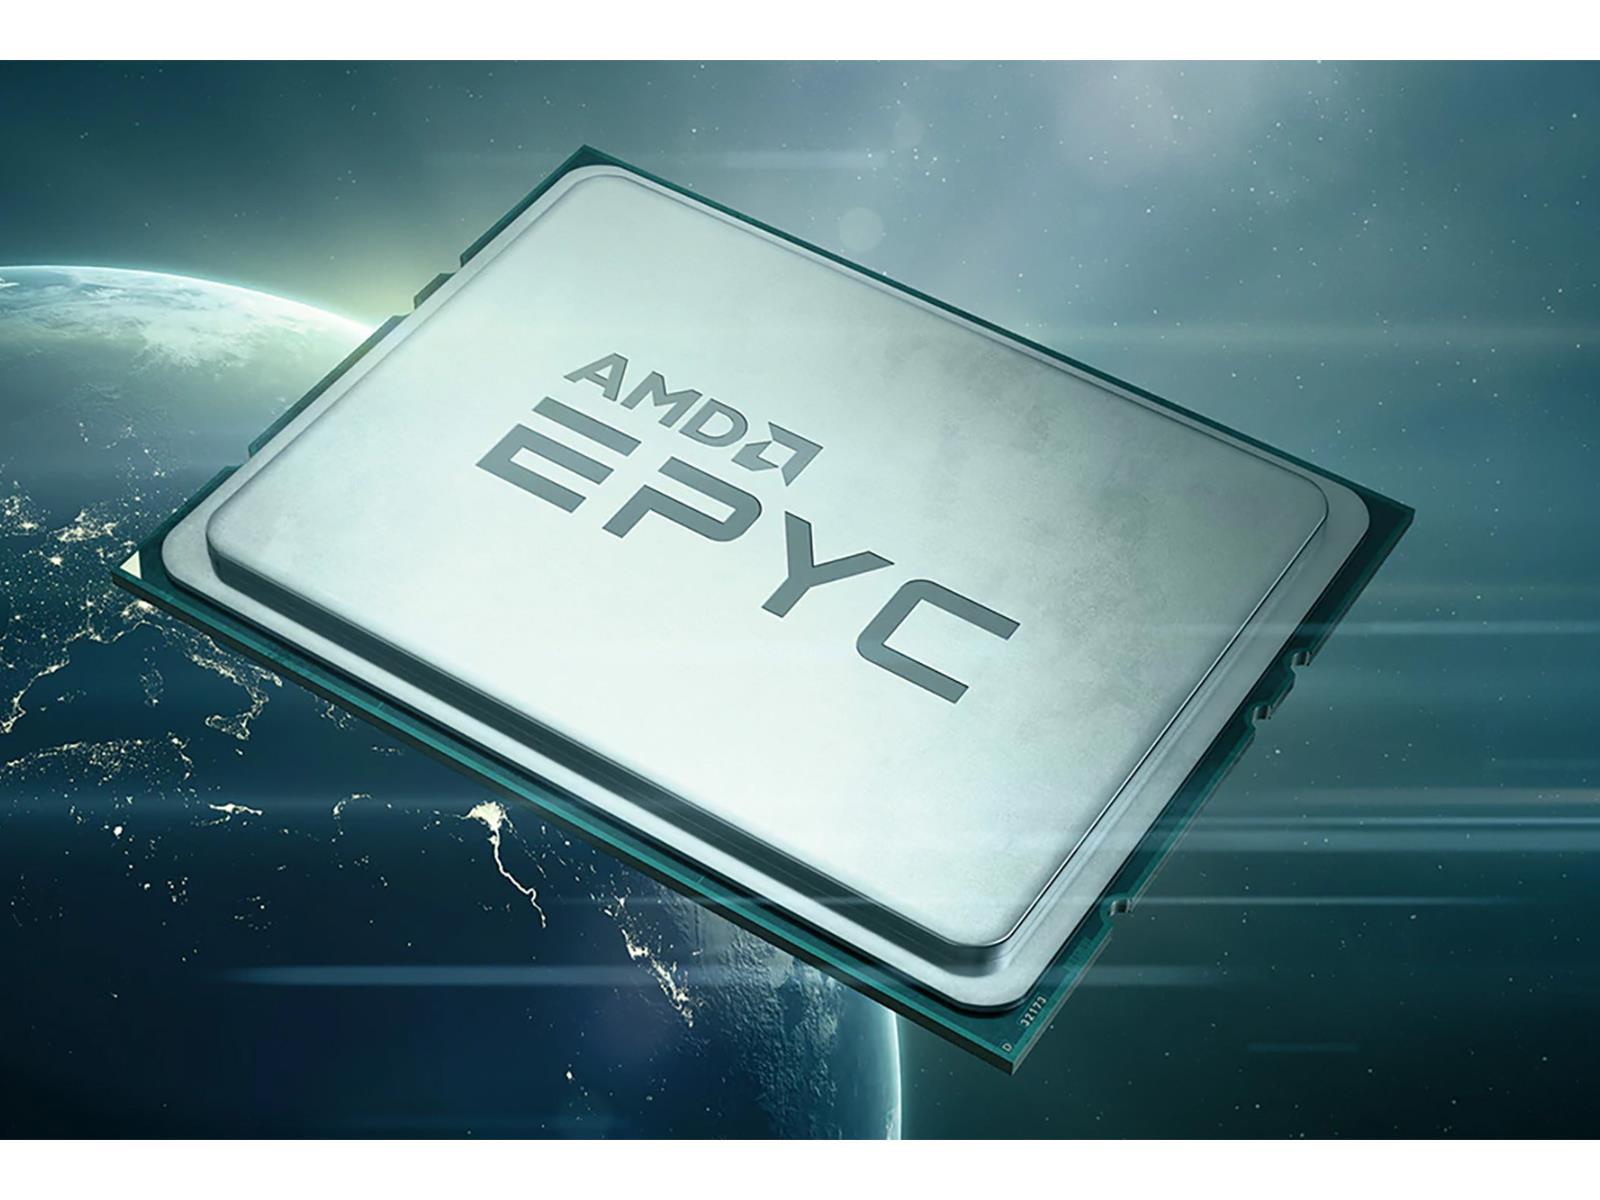 Amd Epyc Milan Zen 3 Server Cpus Could Be Up To 20 Faster Than Zen 2 Hothardware